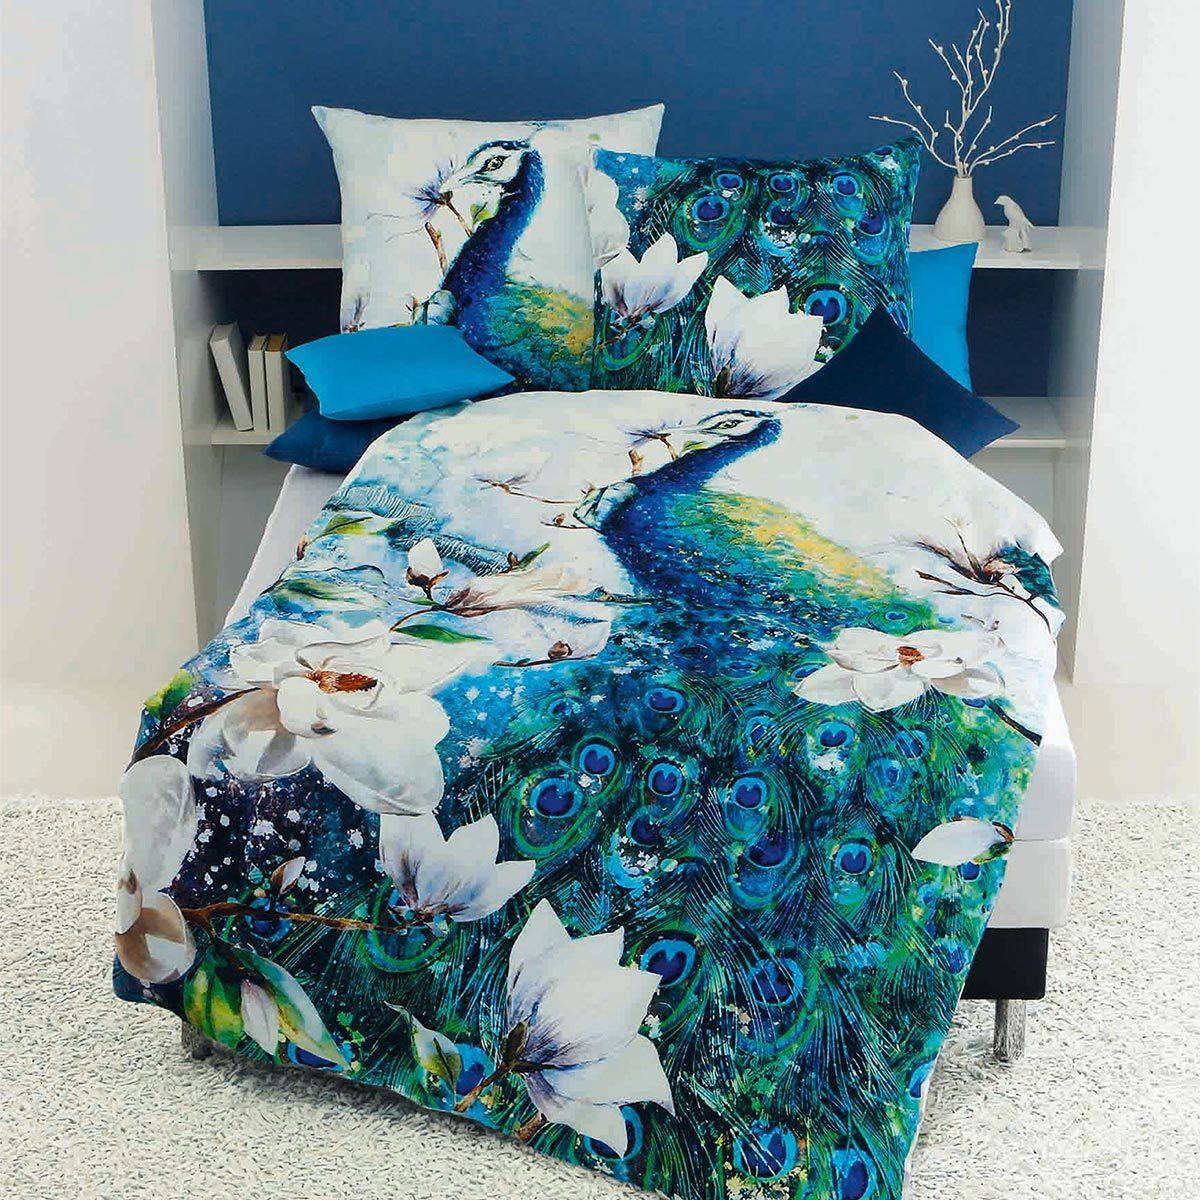 Kaeppel Mako Satin Bettwäsche Peacock Smaragd Günstig Online Kaufen